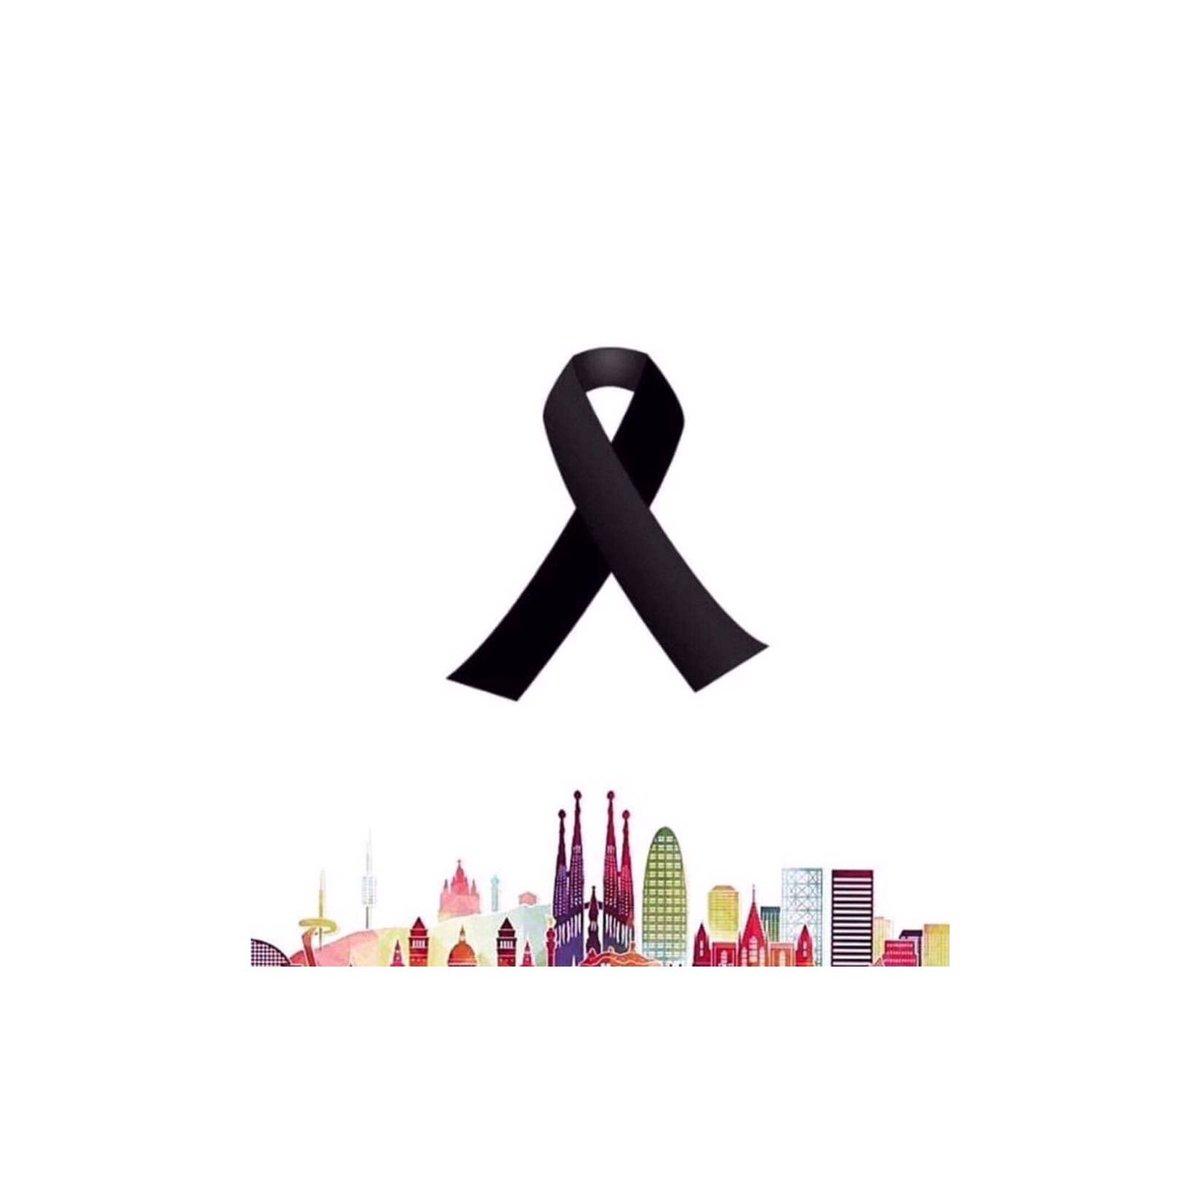 PLEASE #PRAYFORBARCELONA https://t.co/1UgkqUfq9u